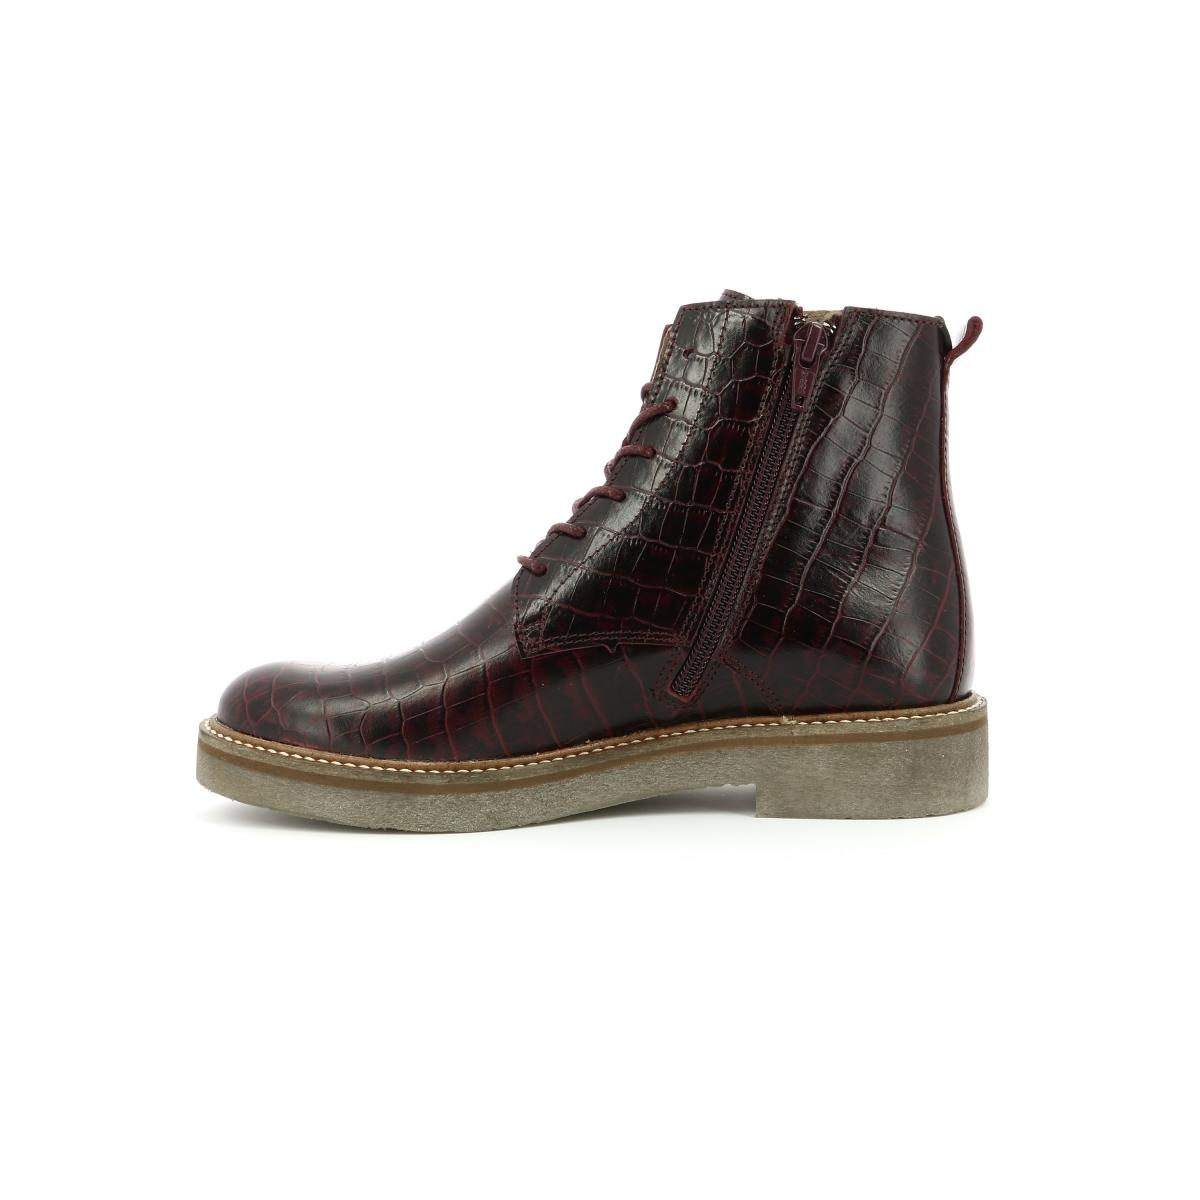 64757d28402a87 Chaussures Femme OXIGENO BORDEAUX - Kickers